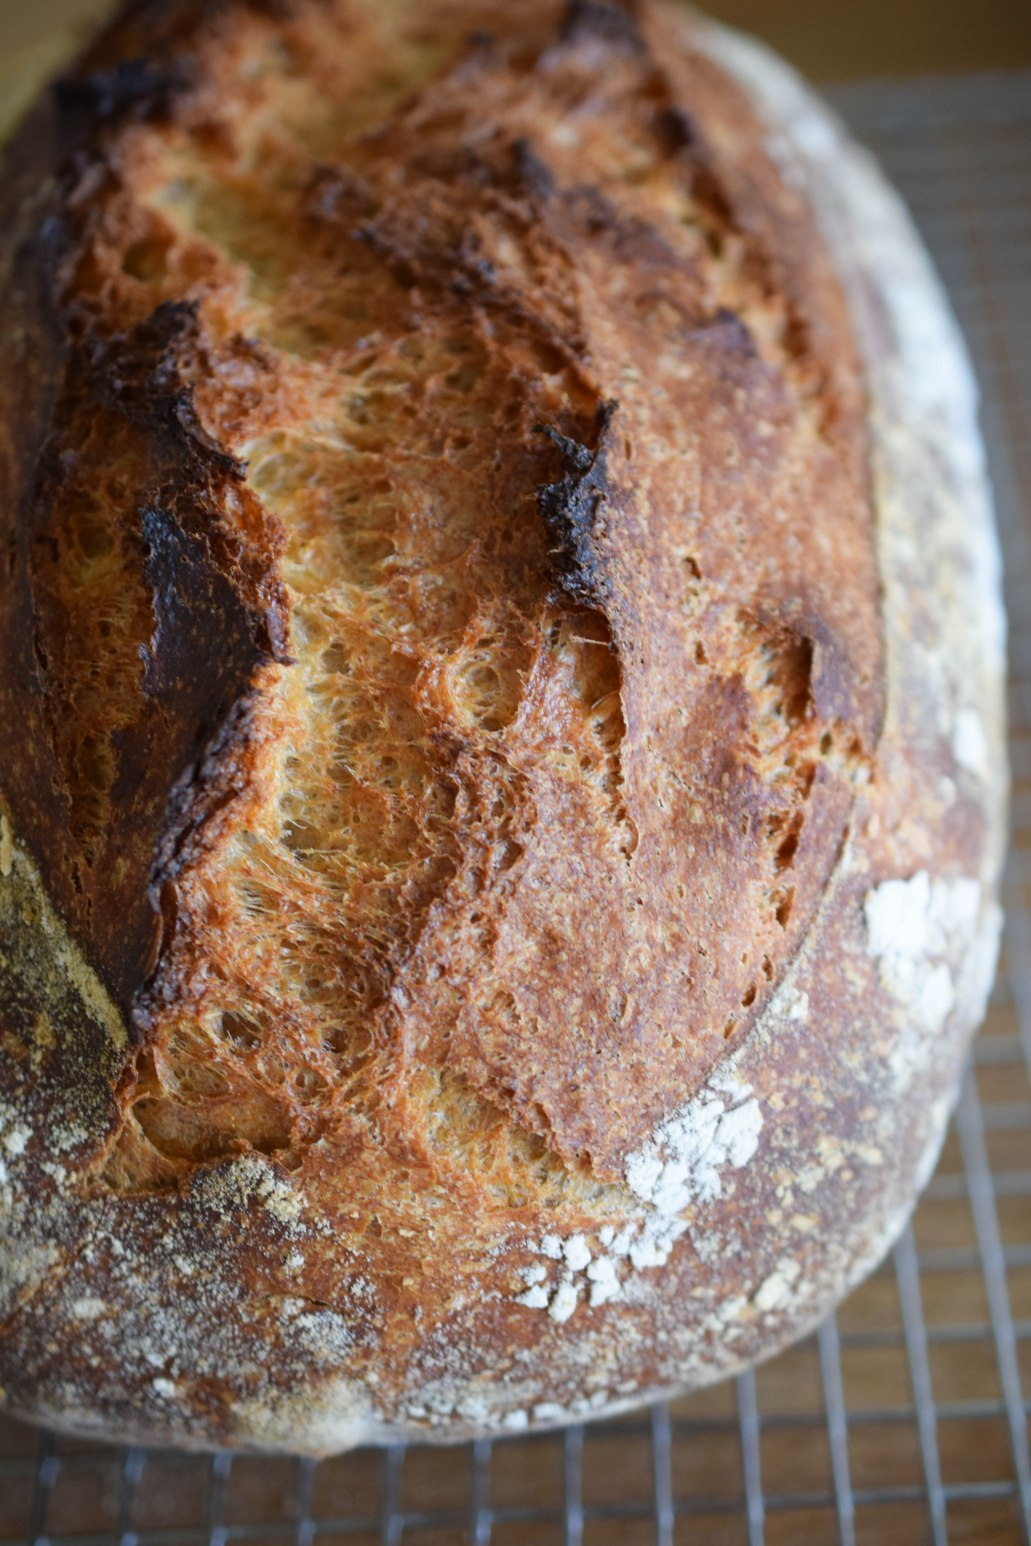 40% Whole Wheat No-Knead Bread – a bag of flour